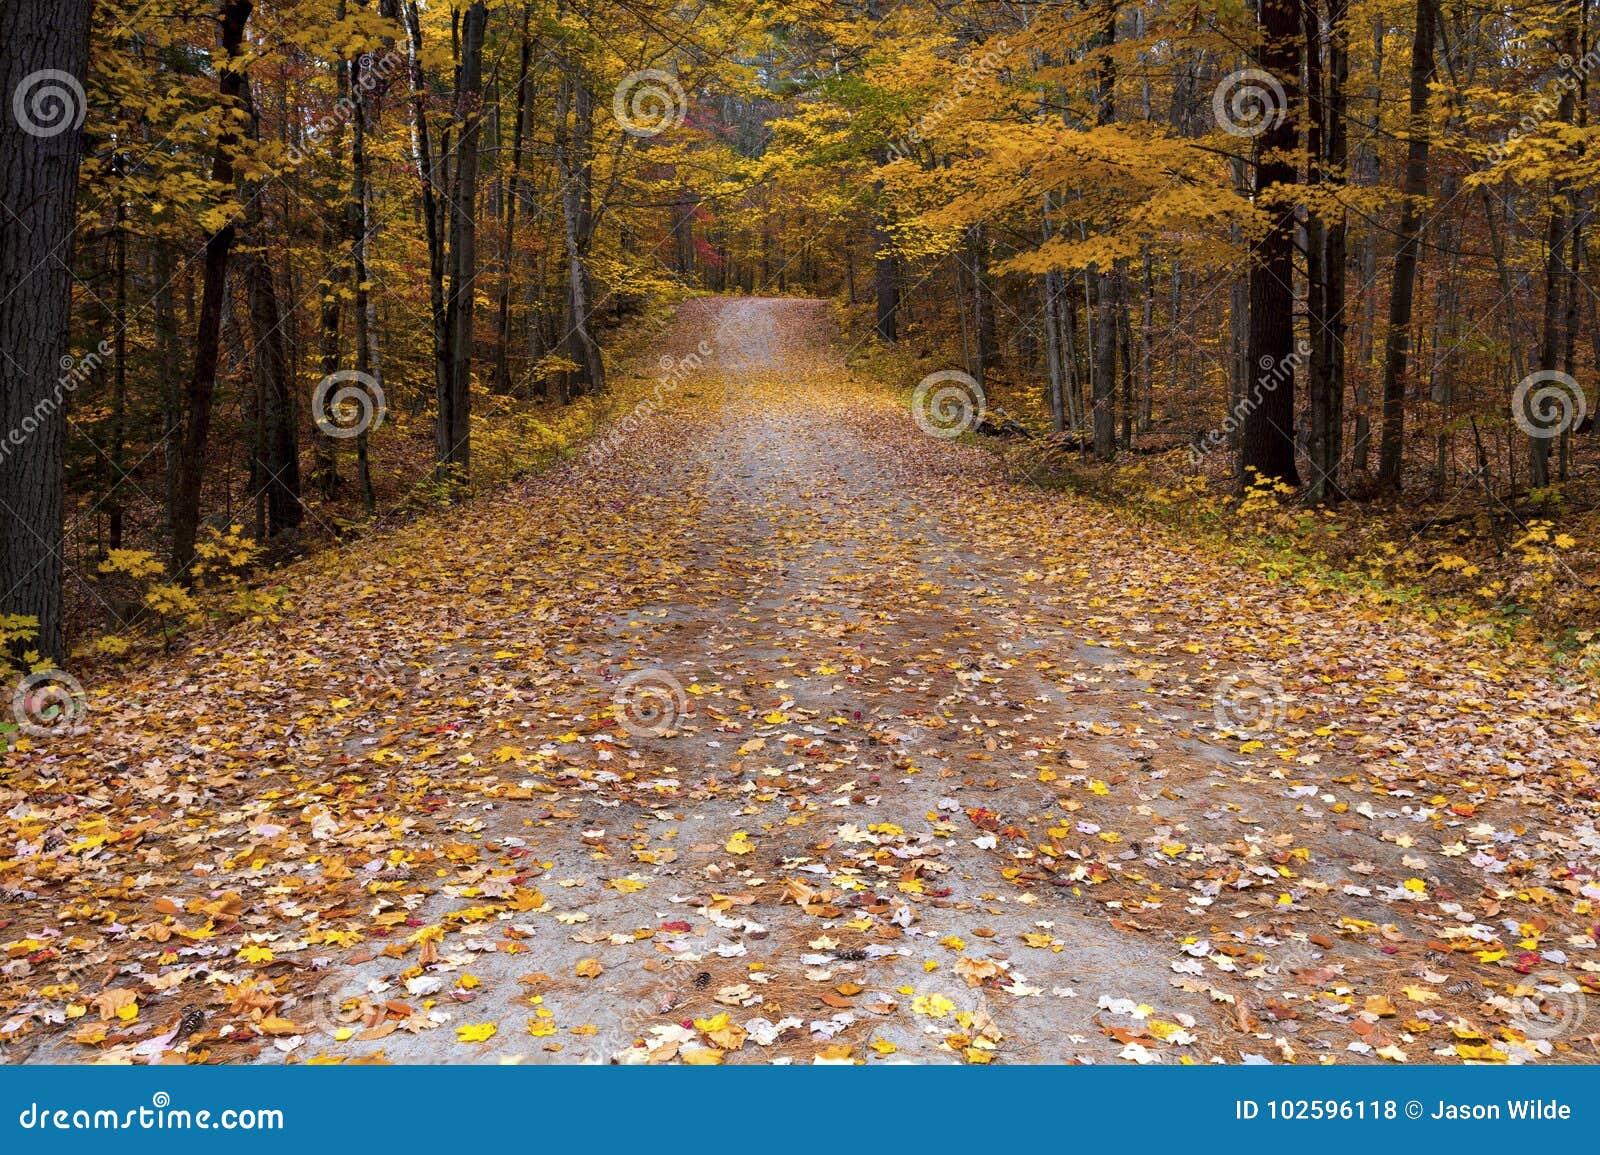 Fall colours in Ontario Canada giant oak trees